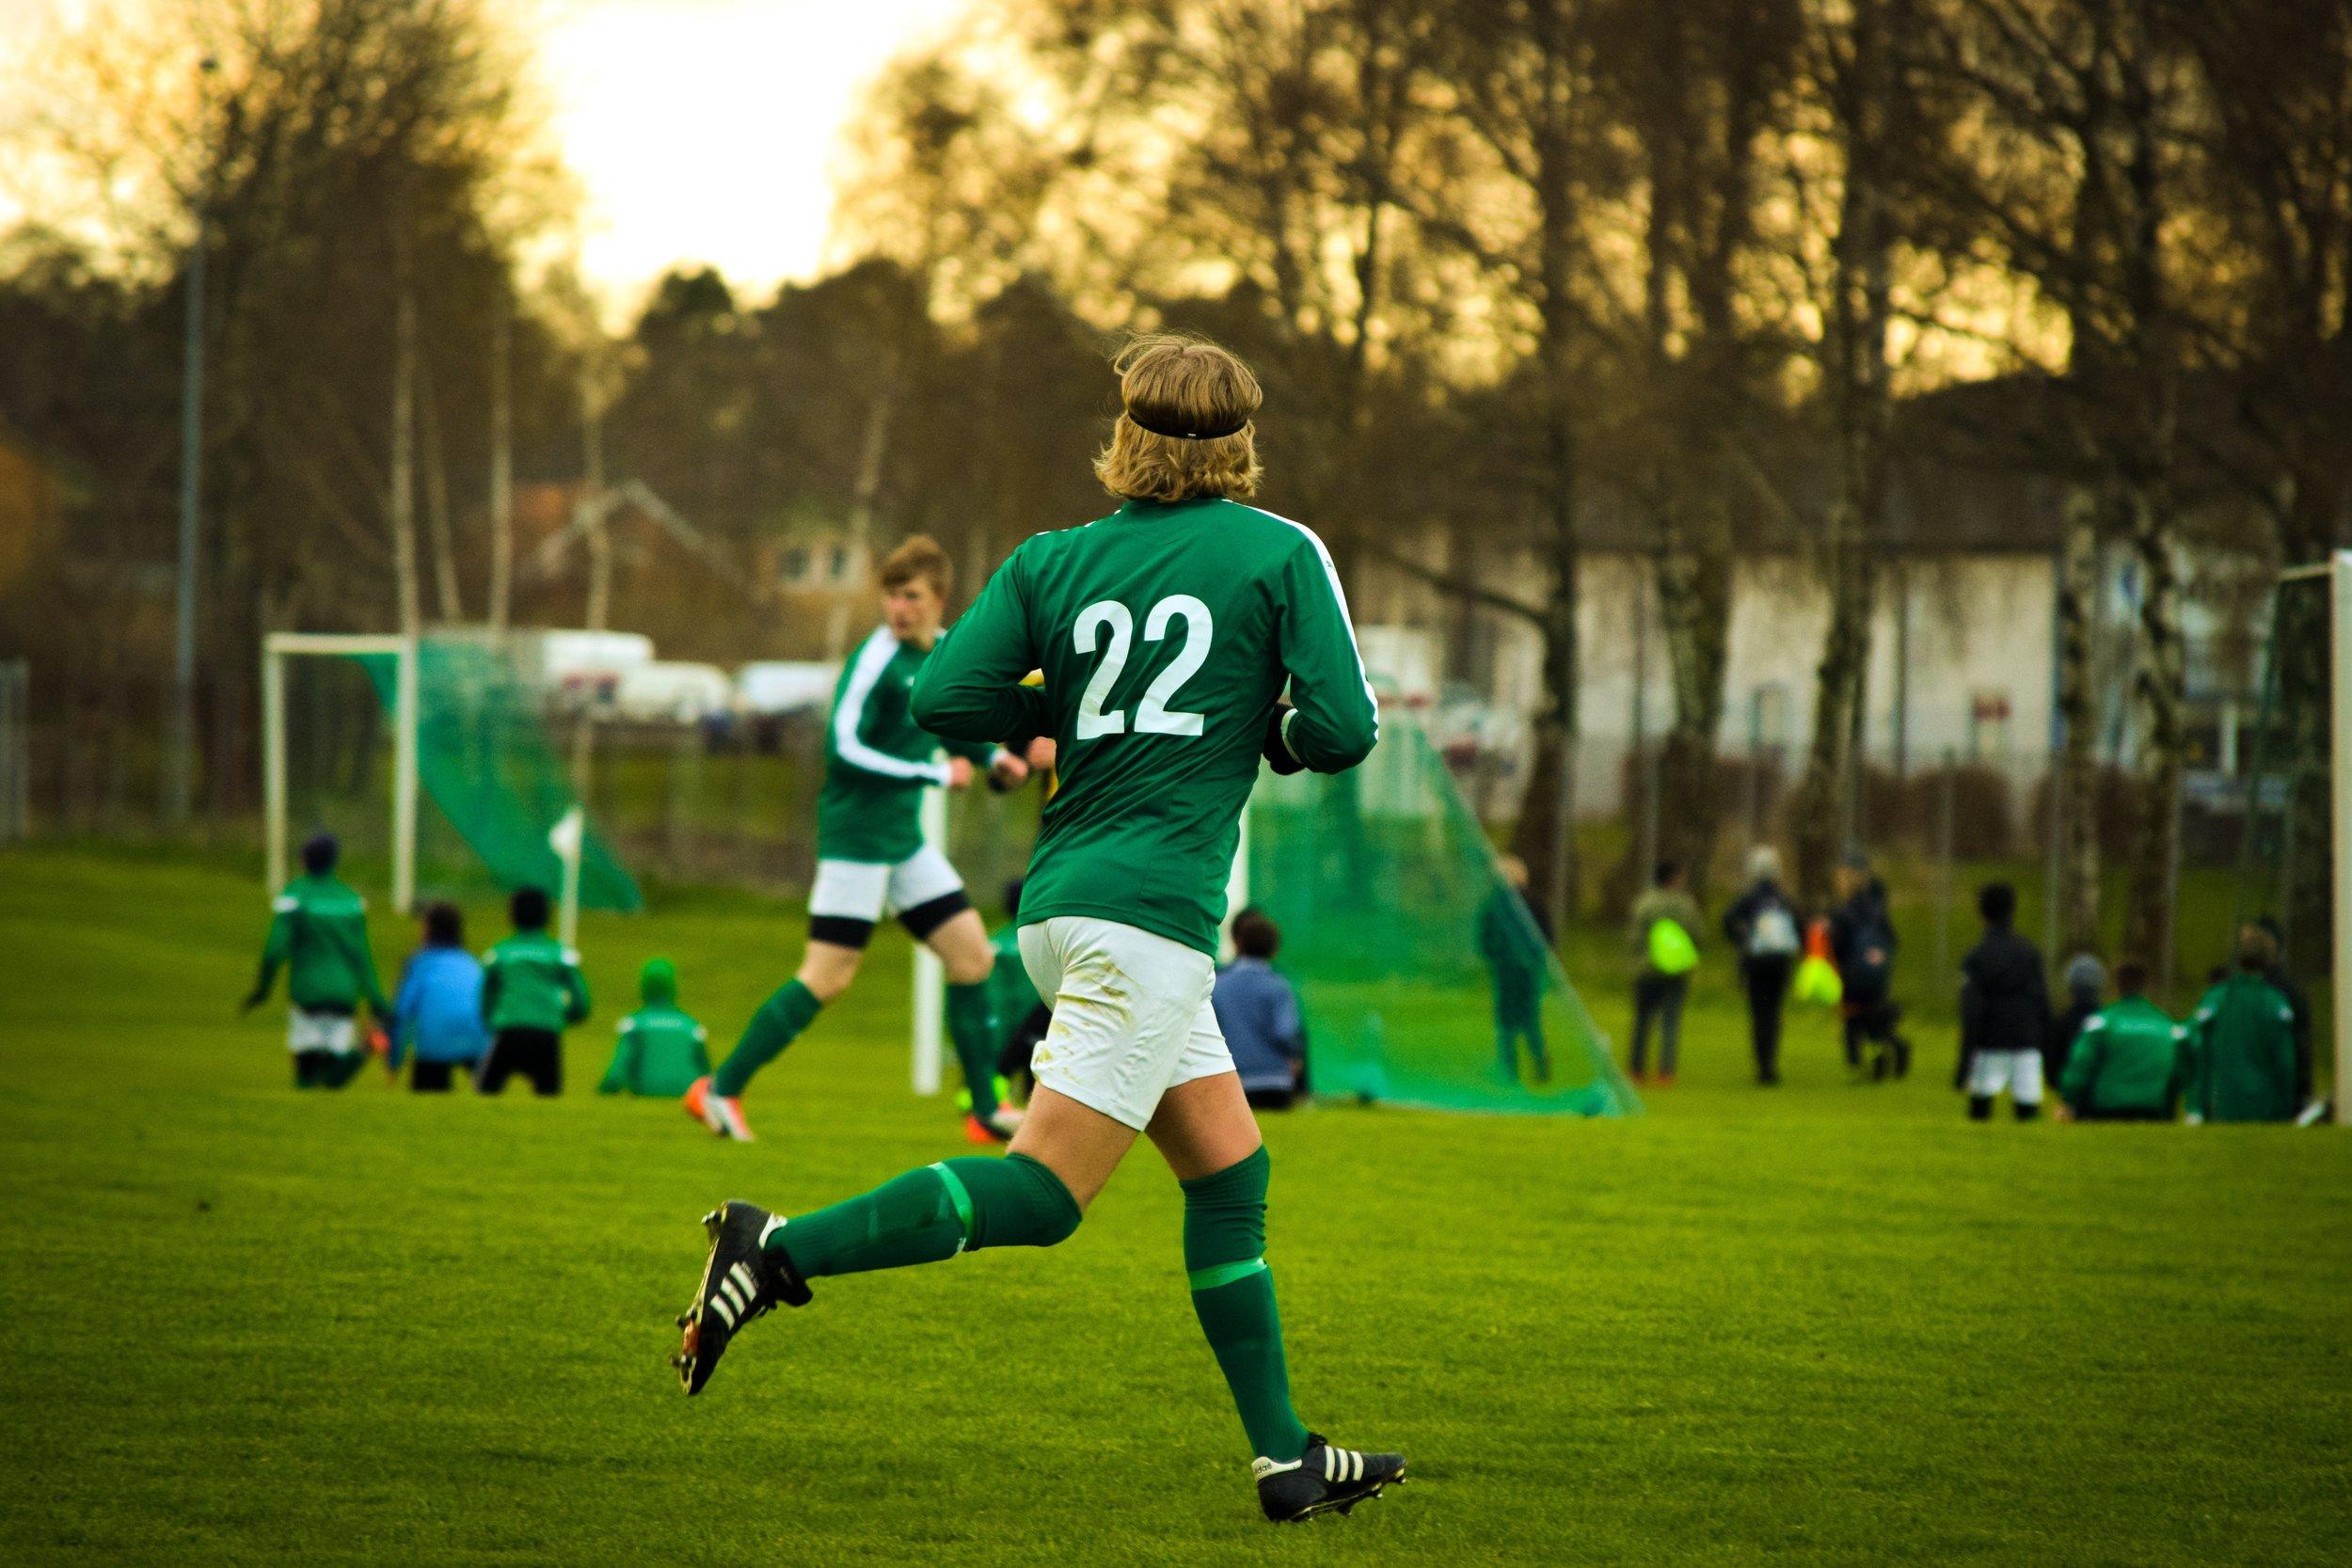 athletes-field-football-532805 (1).jpg